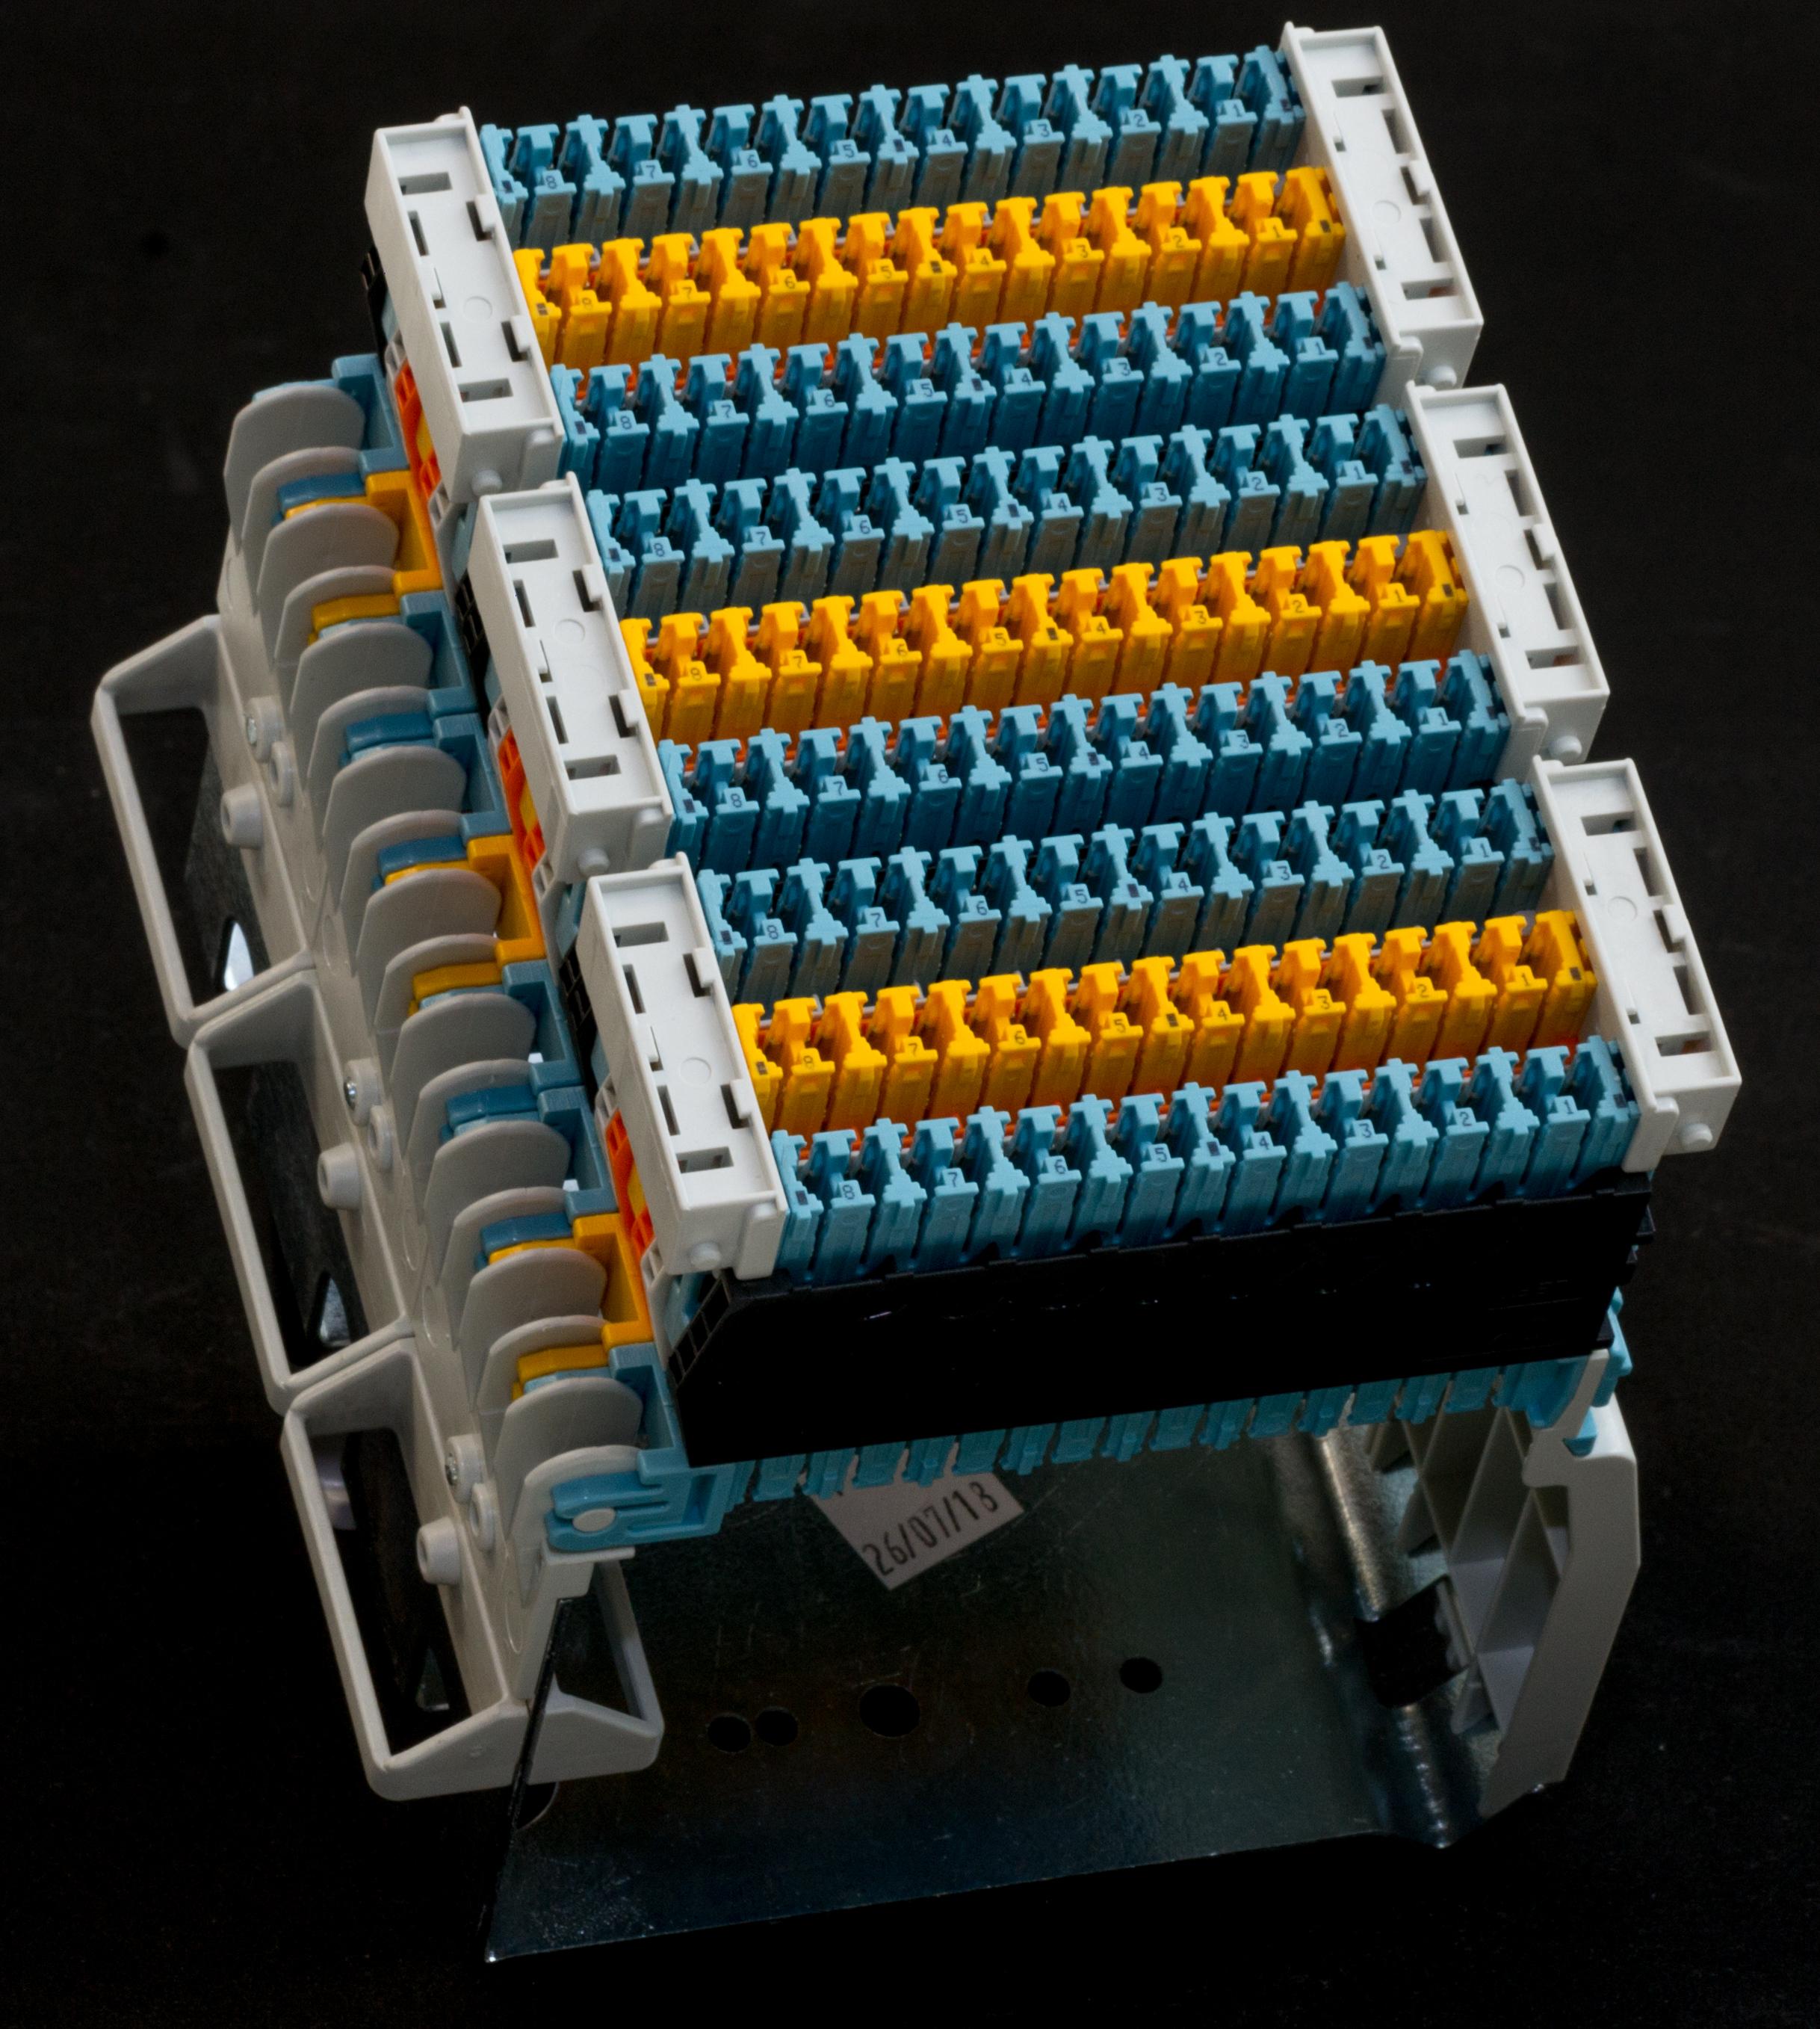 BLOCK BRCP SPLITTER 48 PORTS IDC